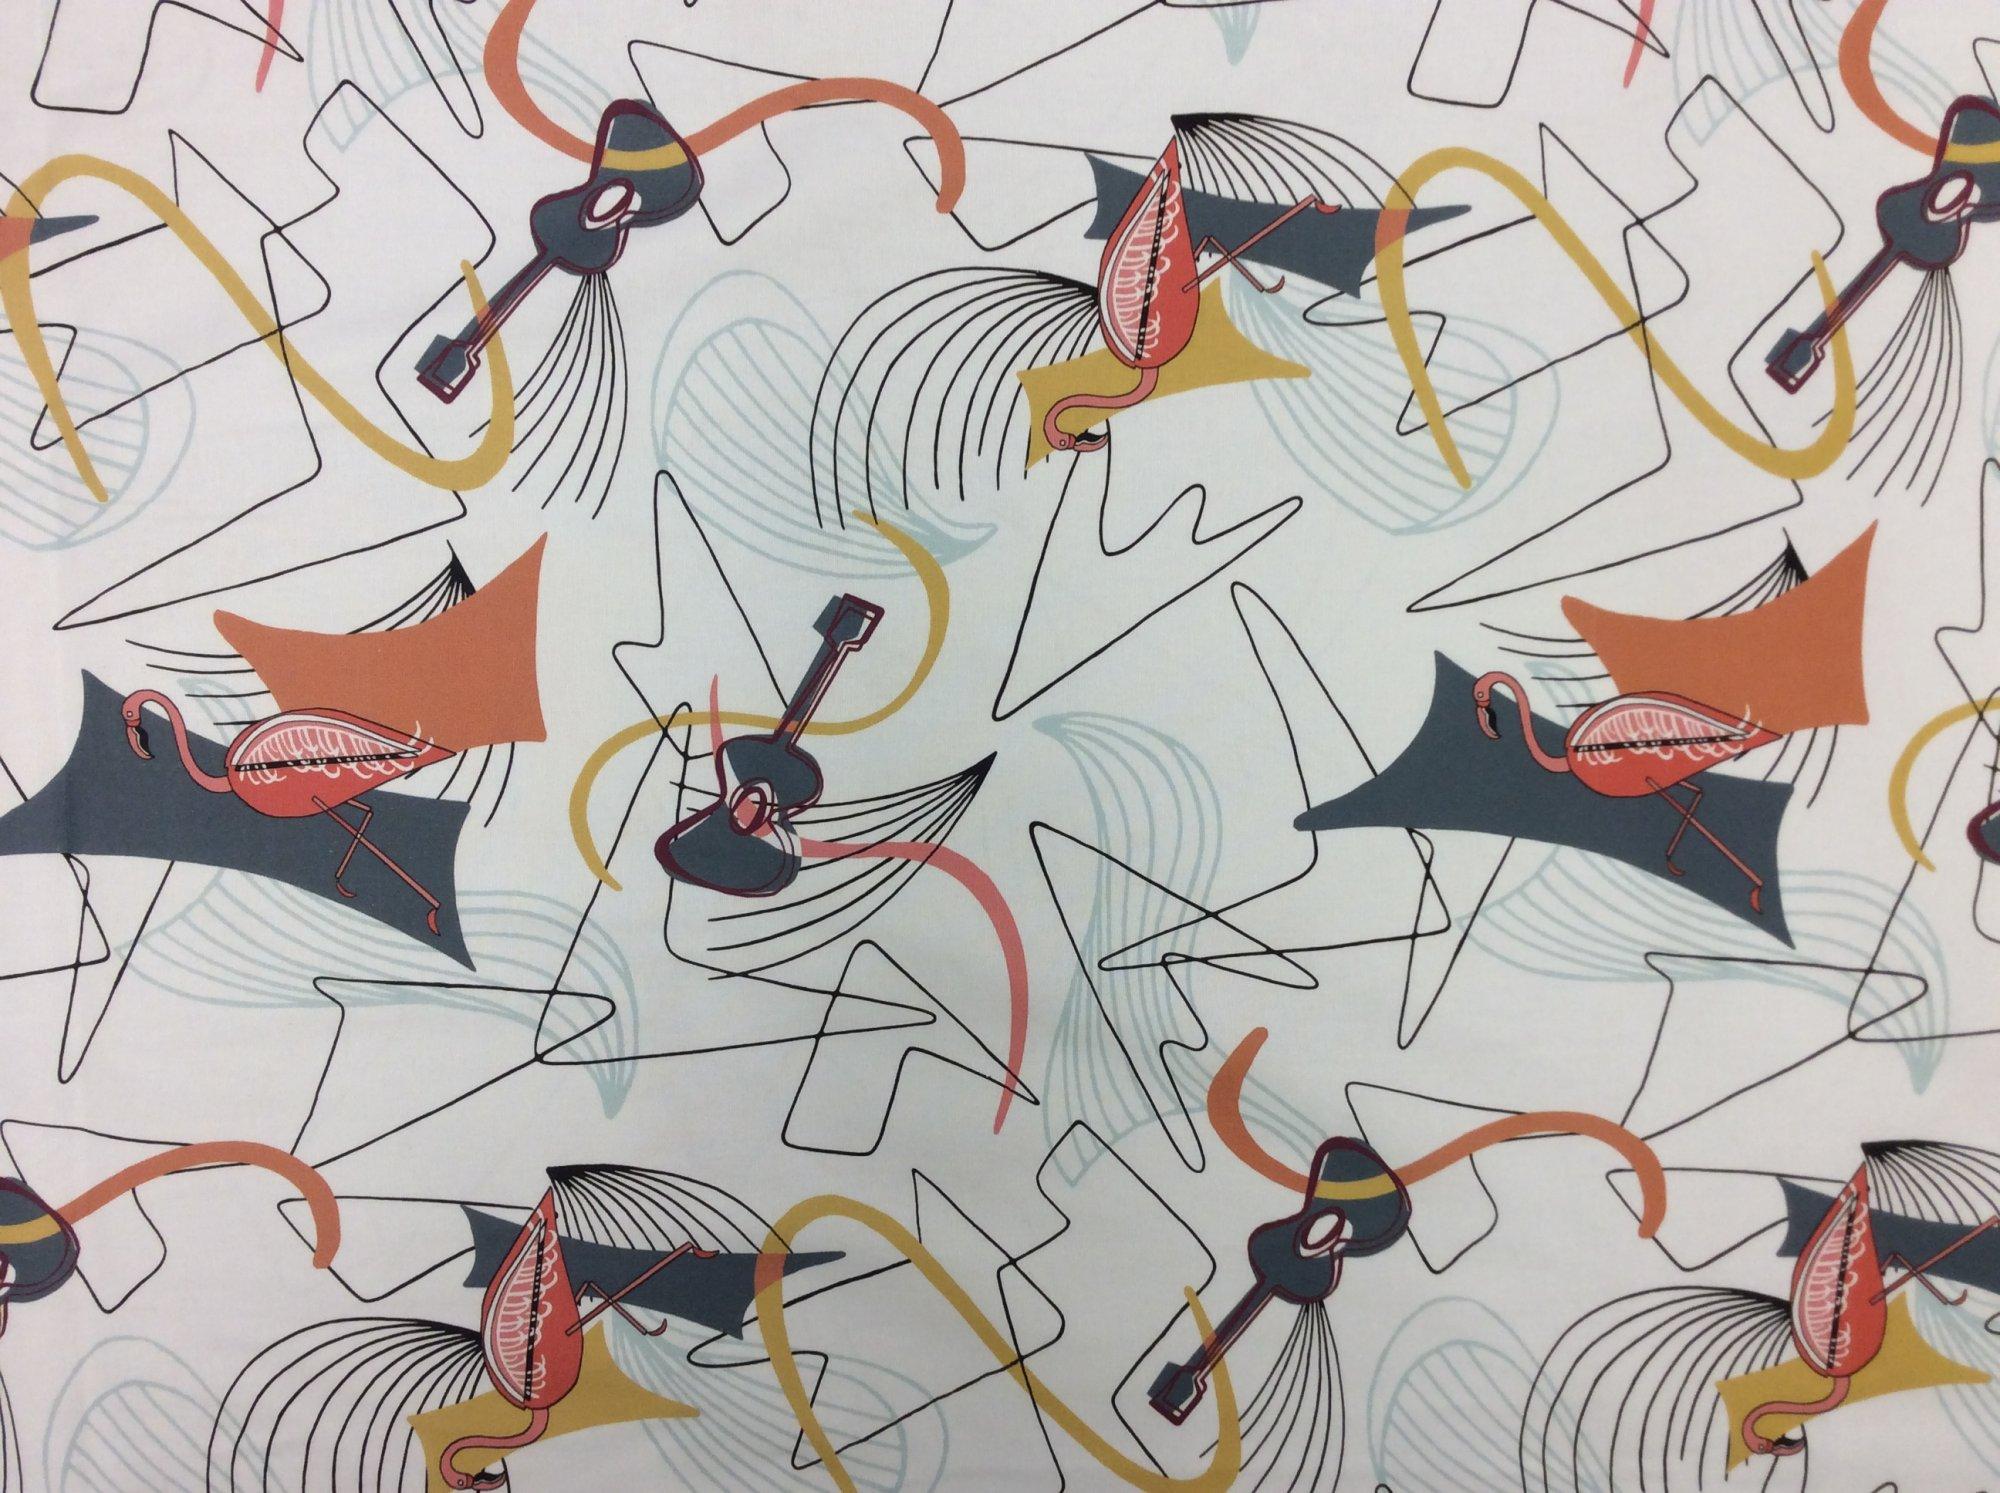 Atomic Retro Mid Century Modern Flamingo Guitar Boomerang Sputnik Space Age MCM Cotton Fabric HM26